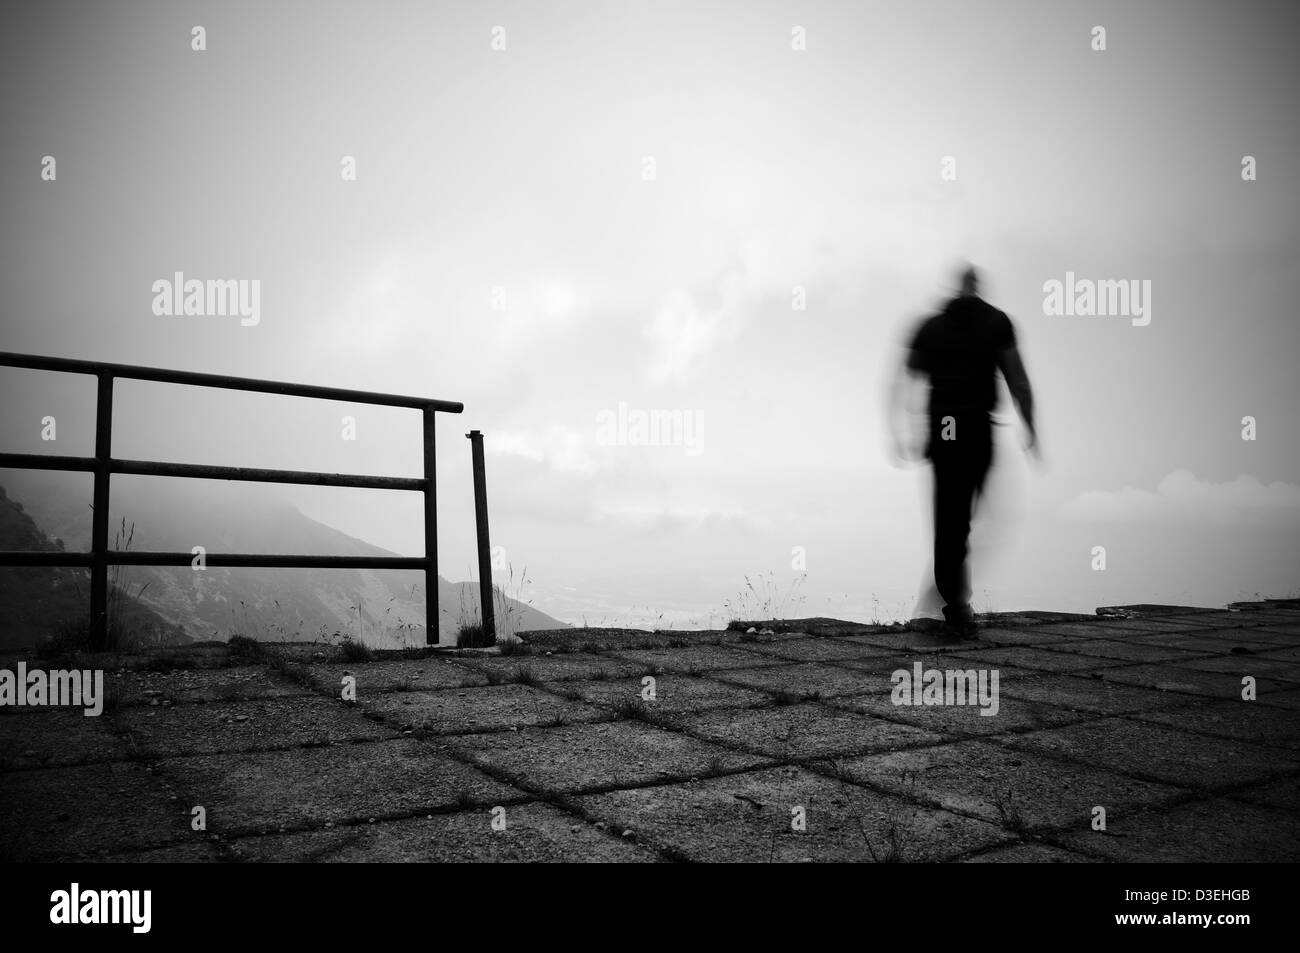 Mann springt ins Leere Stockfoto